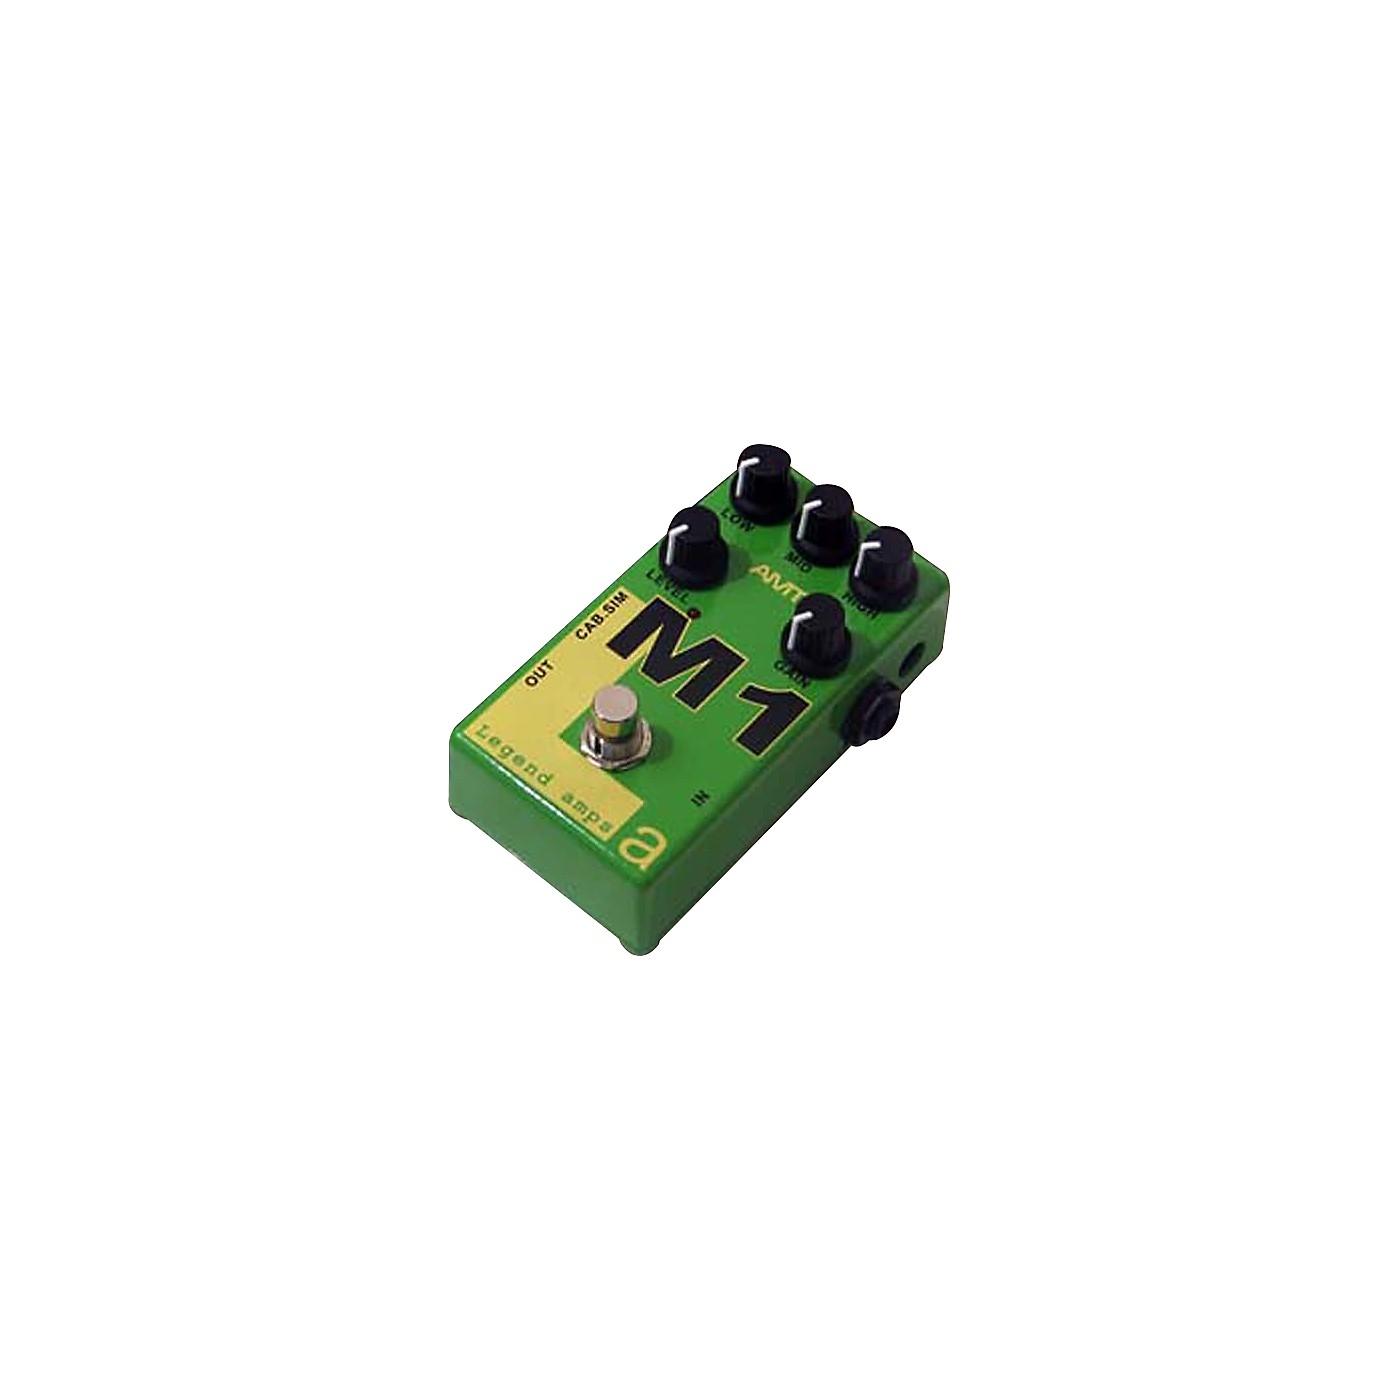 AMT Electronics Legend Amps Series M1 Distortion Guitar Effects Pedal thumbnail